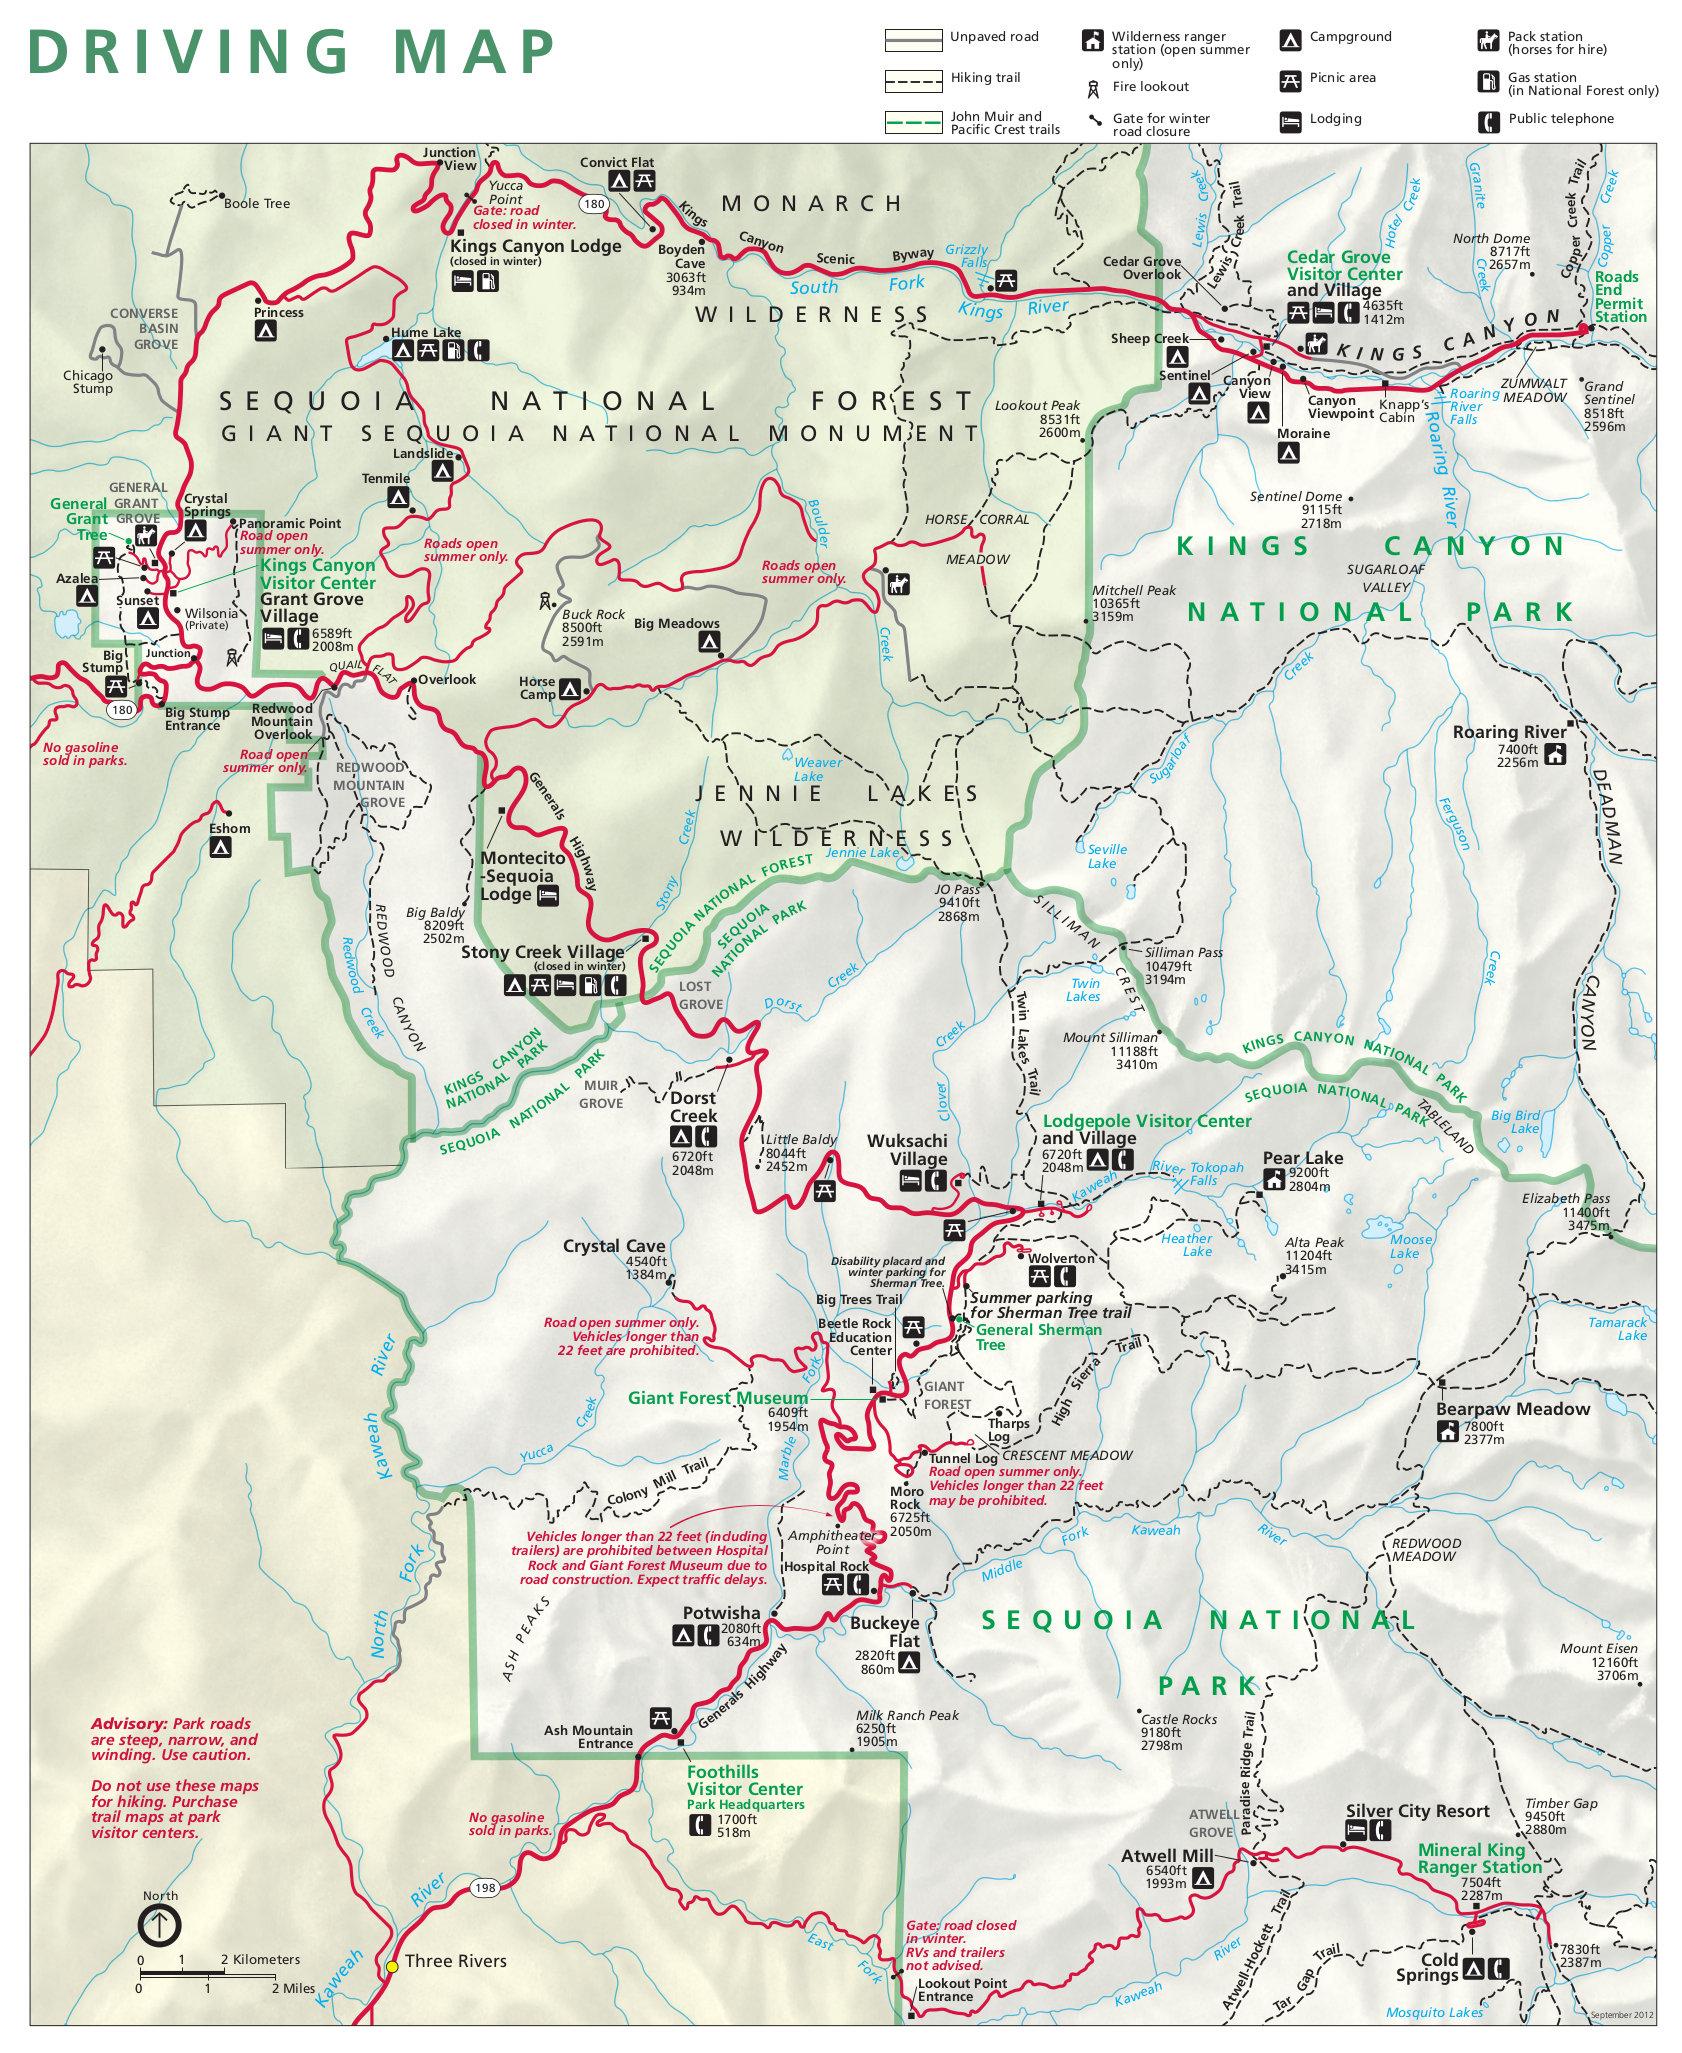 Parchi Nazionali: Sequoia & Kings Canyon